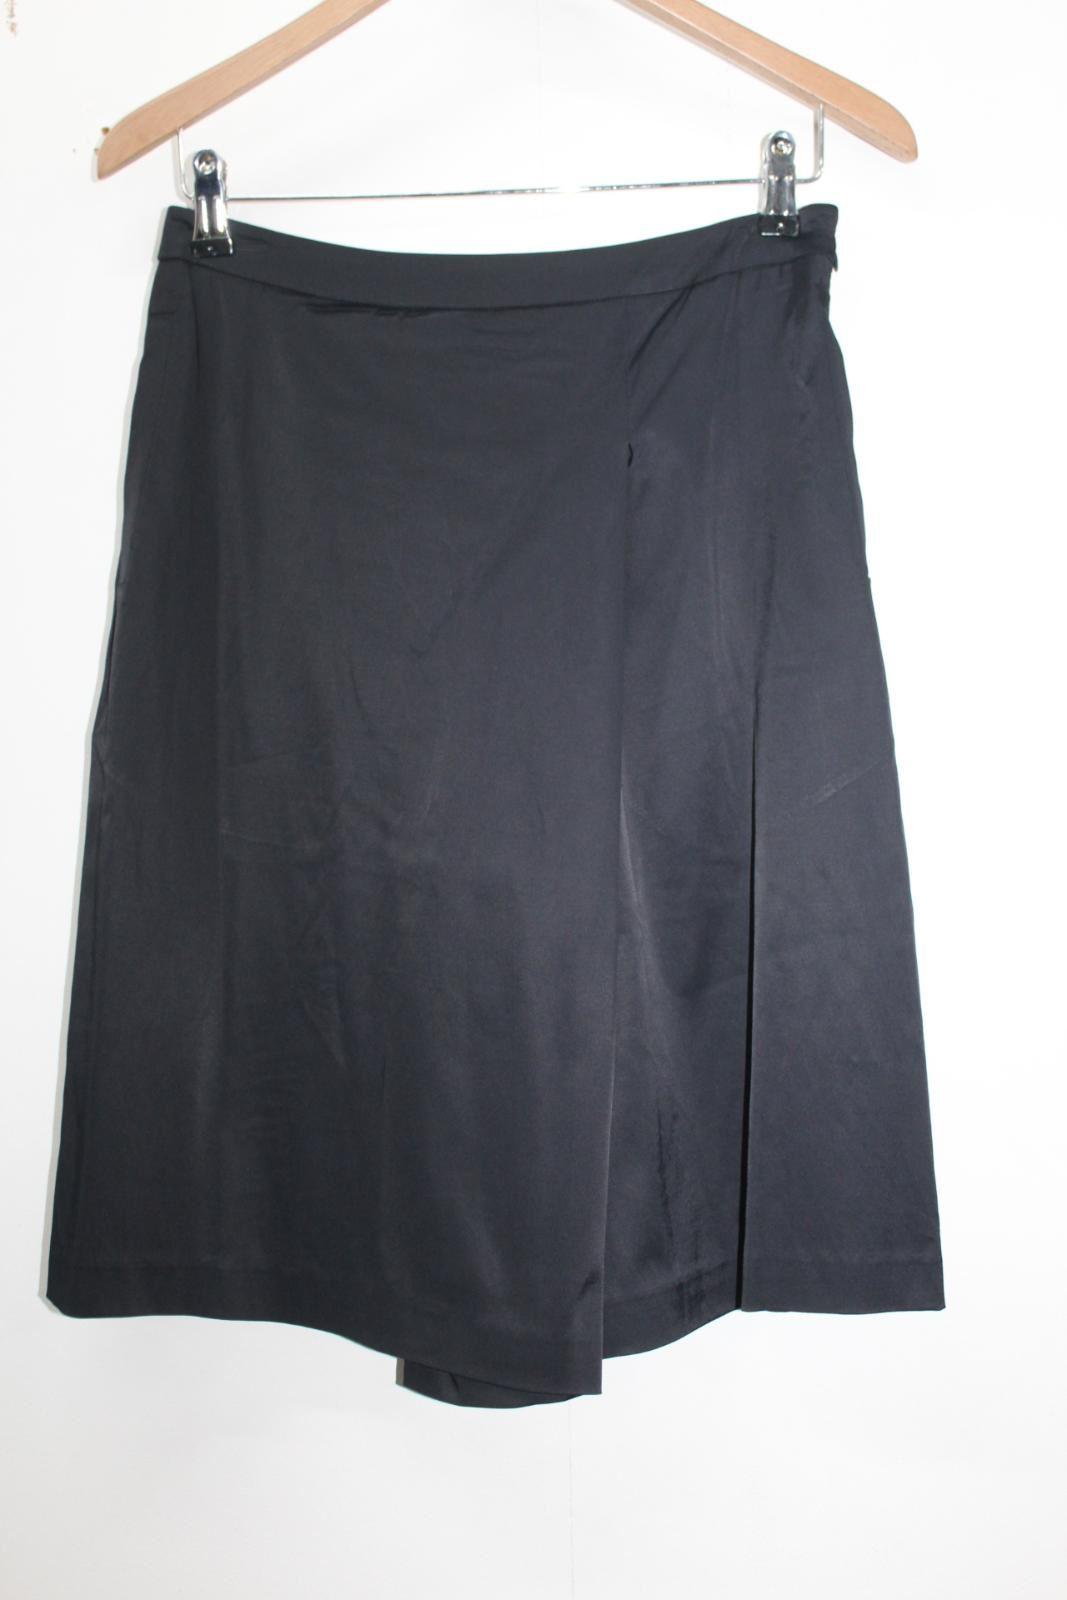 alta vita W26 pantaloncini Saba blu Eu36 pantaloncini Ladies Uk8 scuro gonna qwT7CIUC